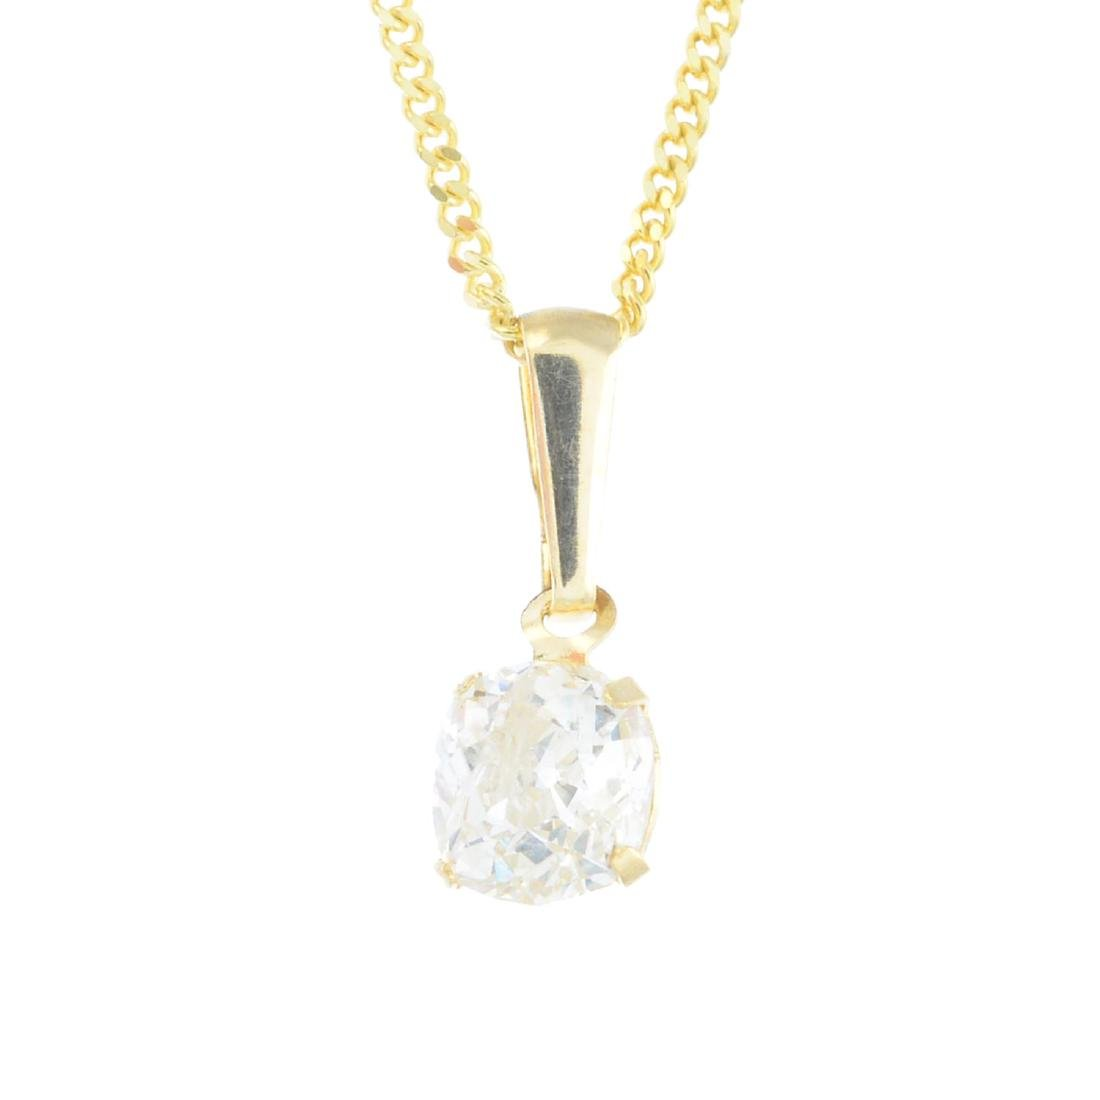 A diamond pendant. The brilliant-cut diamond, with